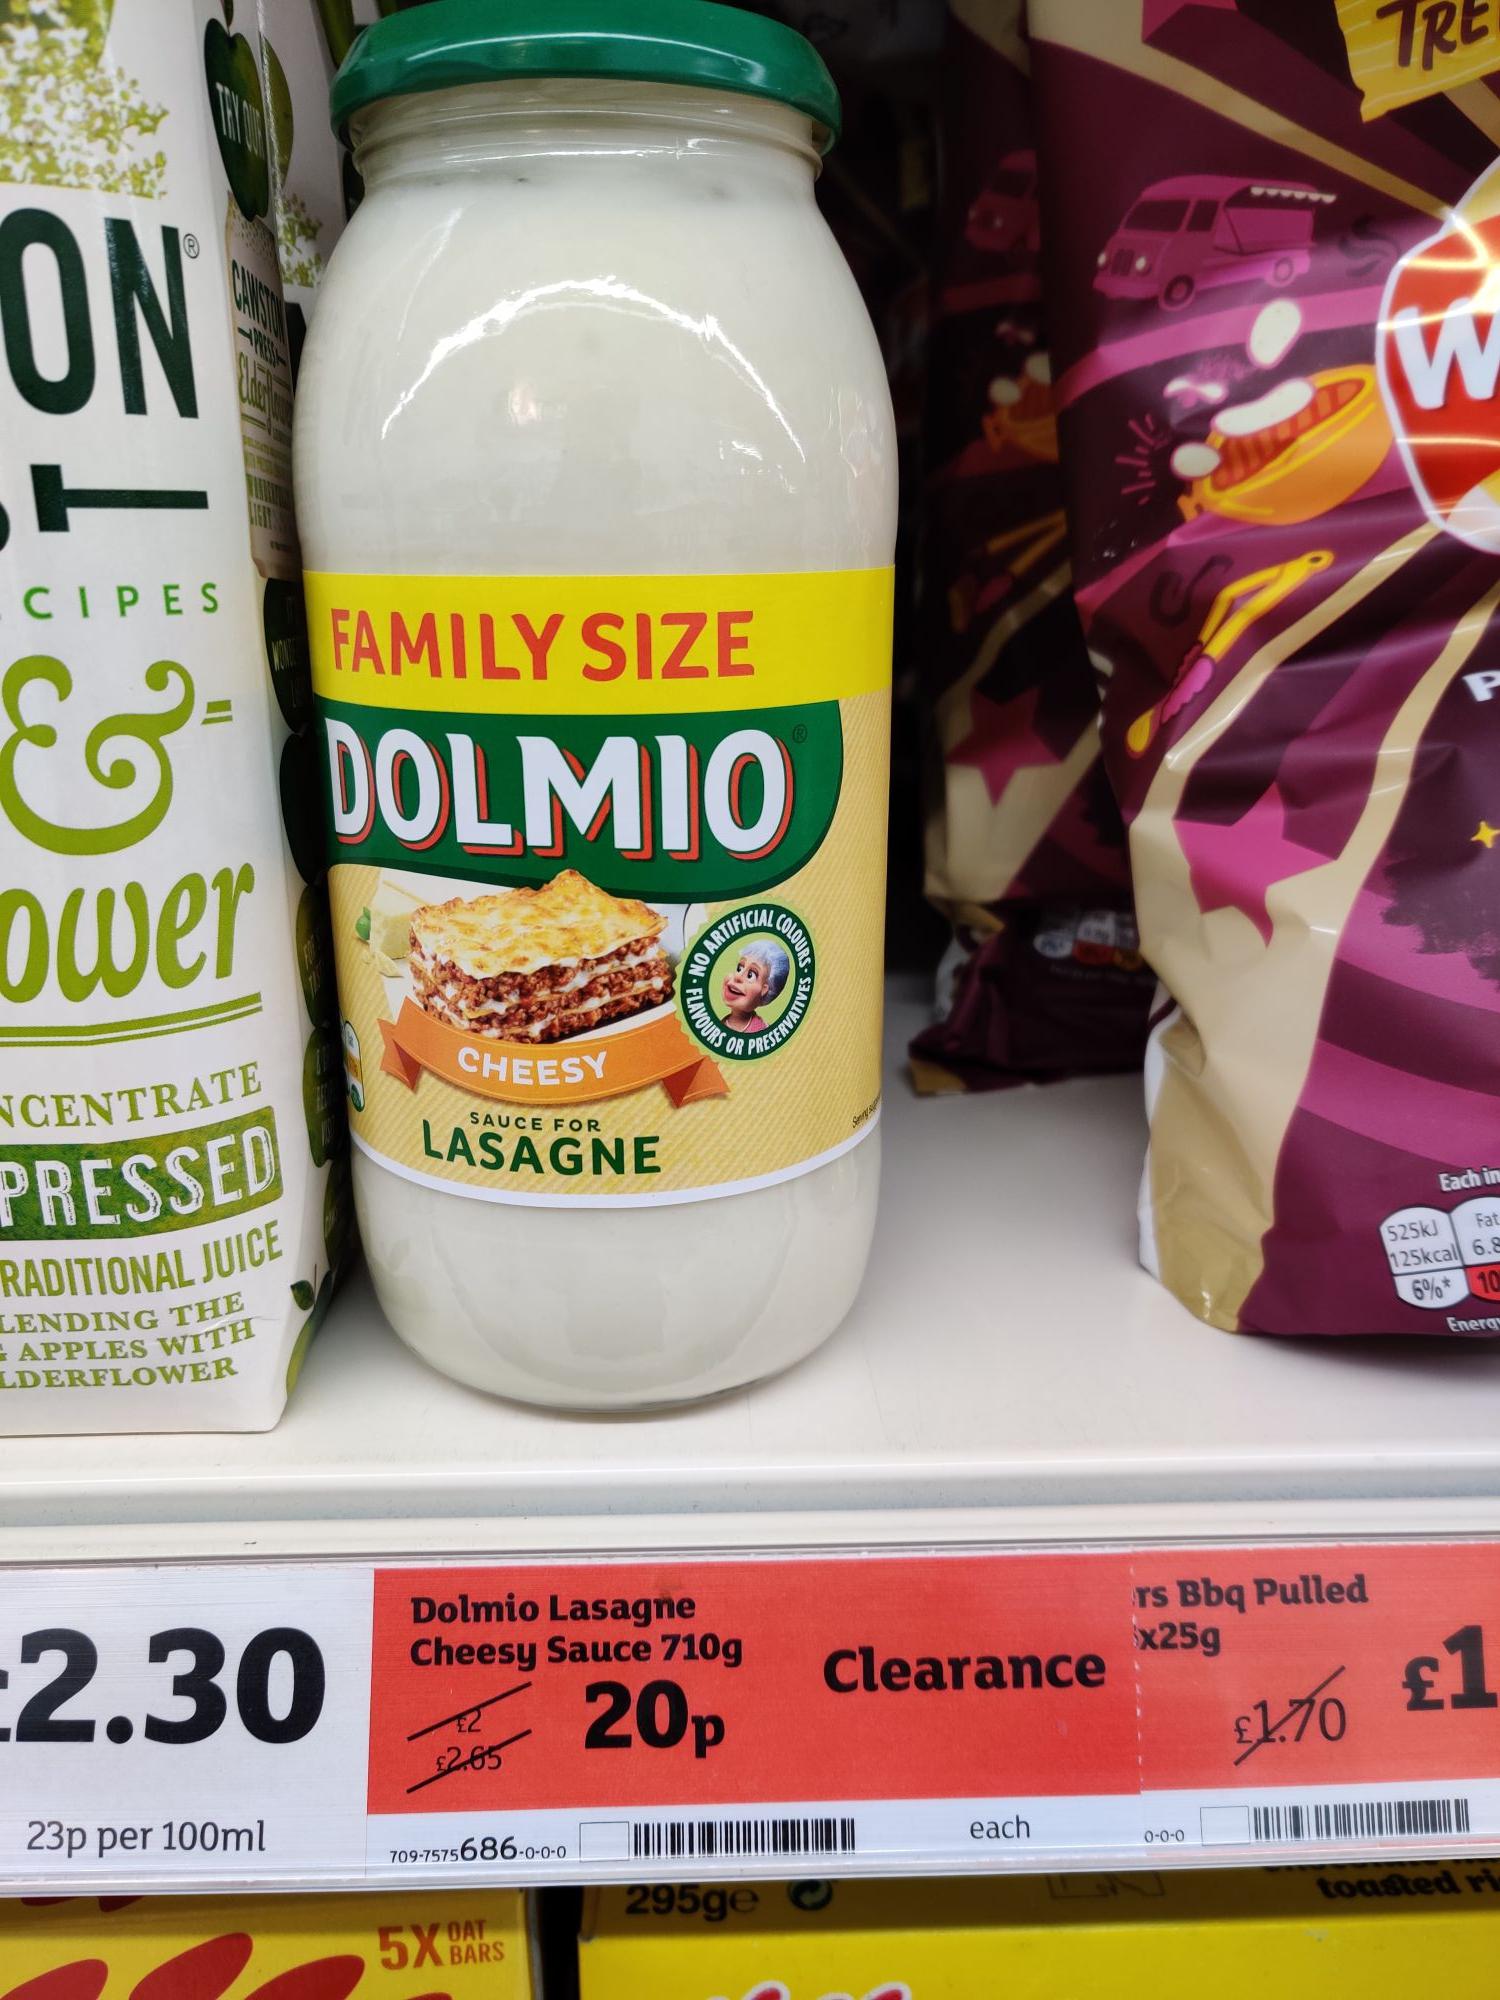 Family Size Dolmio Cheesy sauce for lasagne 710g 20p @ Sainsburys Dundee